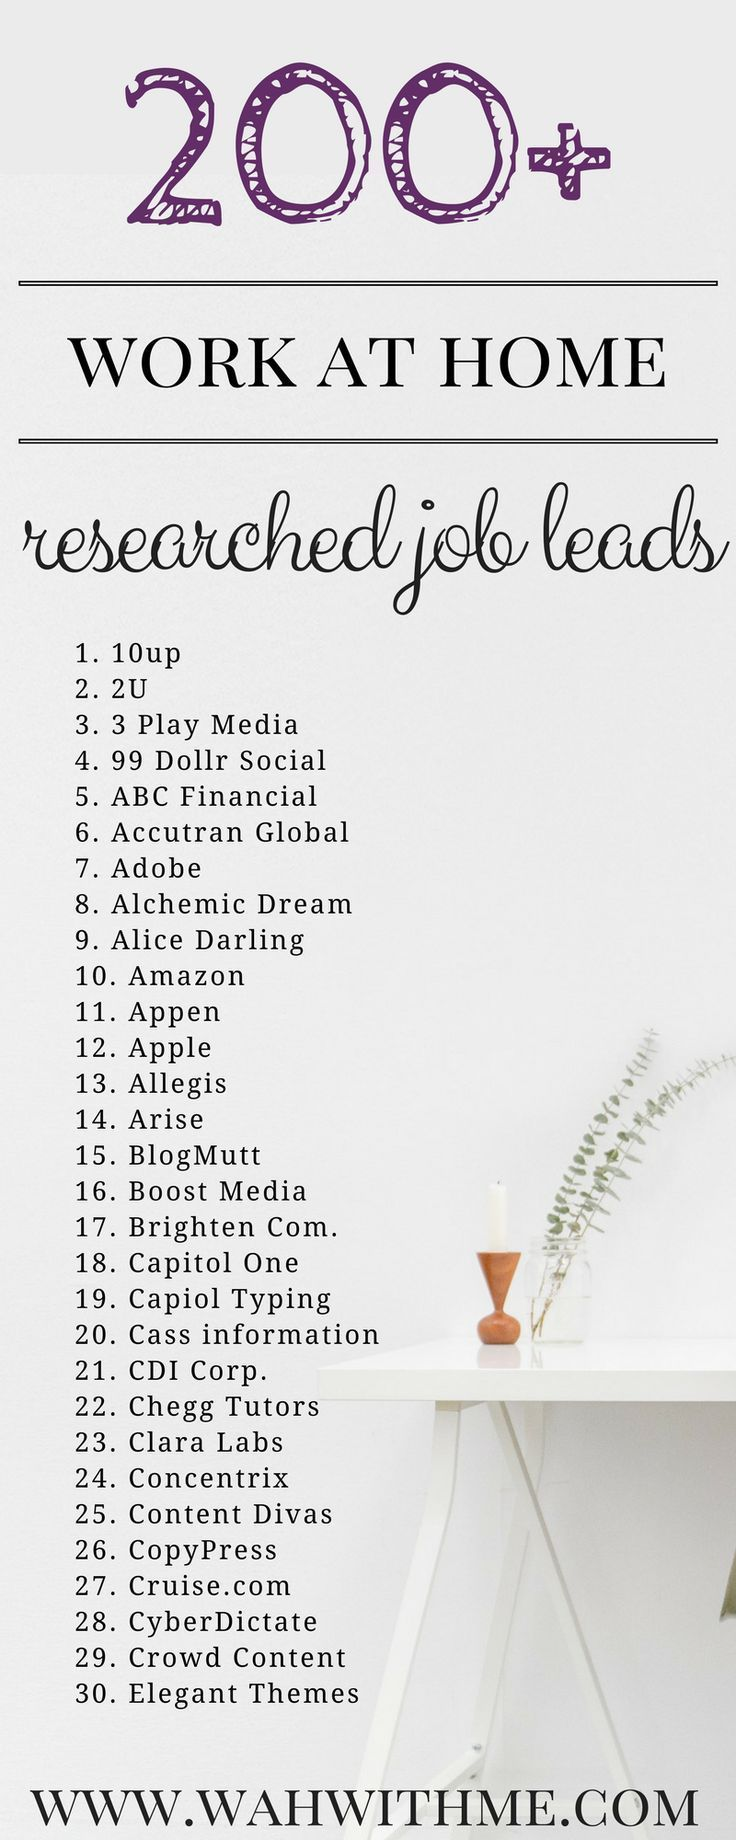 Work at home job leads, work from home, legitimate jobs online, make money online, earn money, remote, jobs, job, transcription, writing, blogging, development, software, technology, service, nonphone